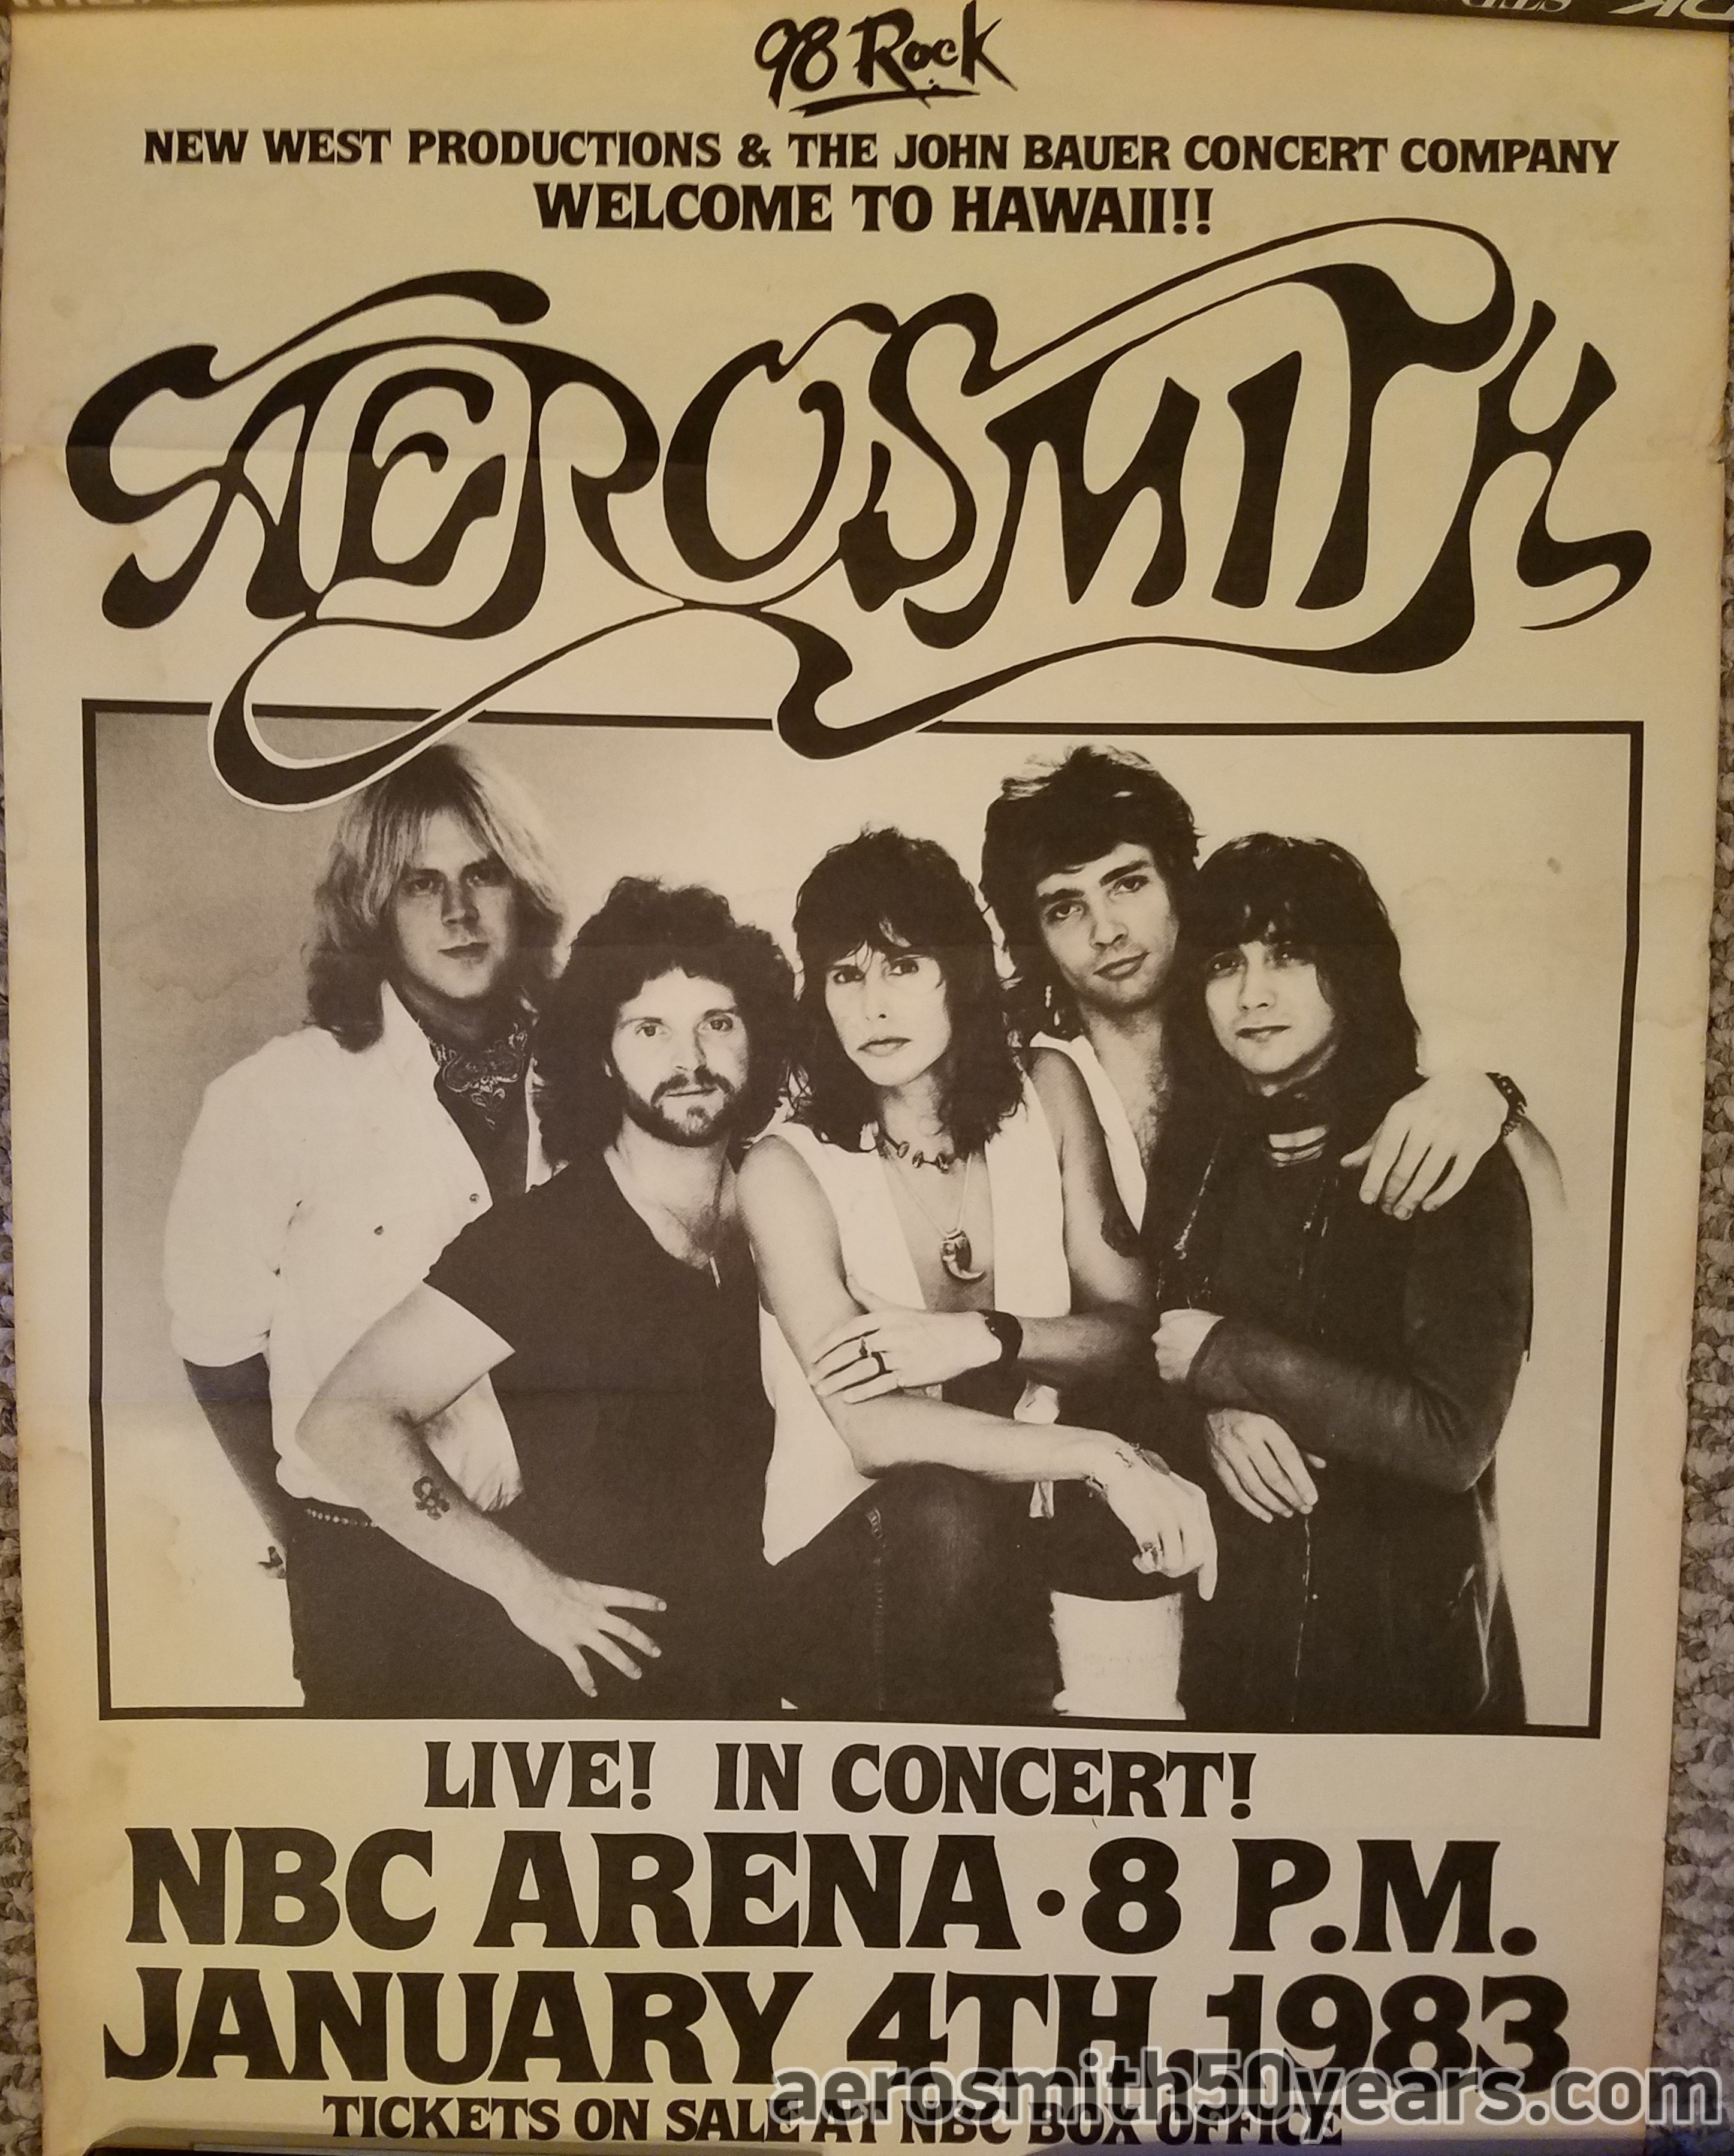 January 4th, 1983 NBC Arena Hawaii Concert Poster